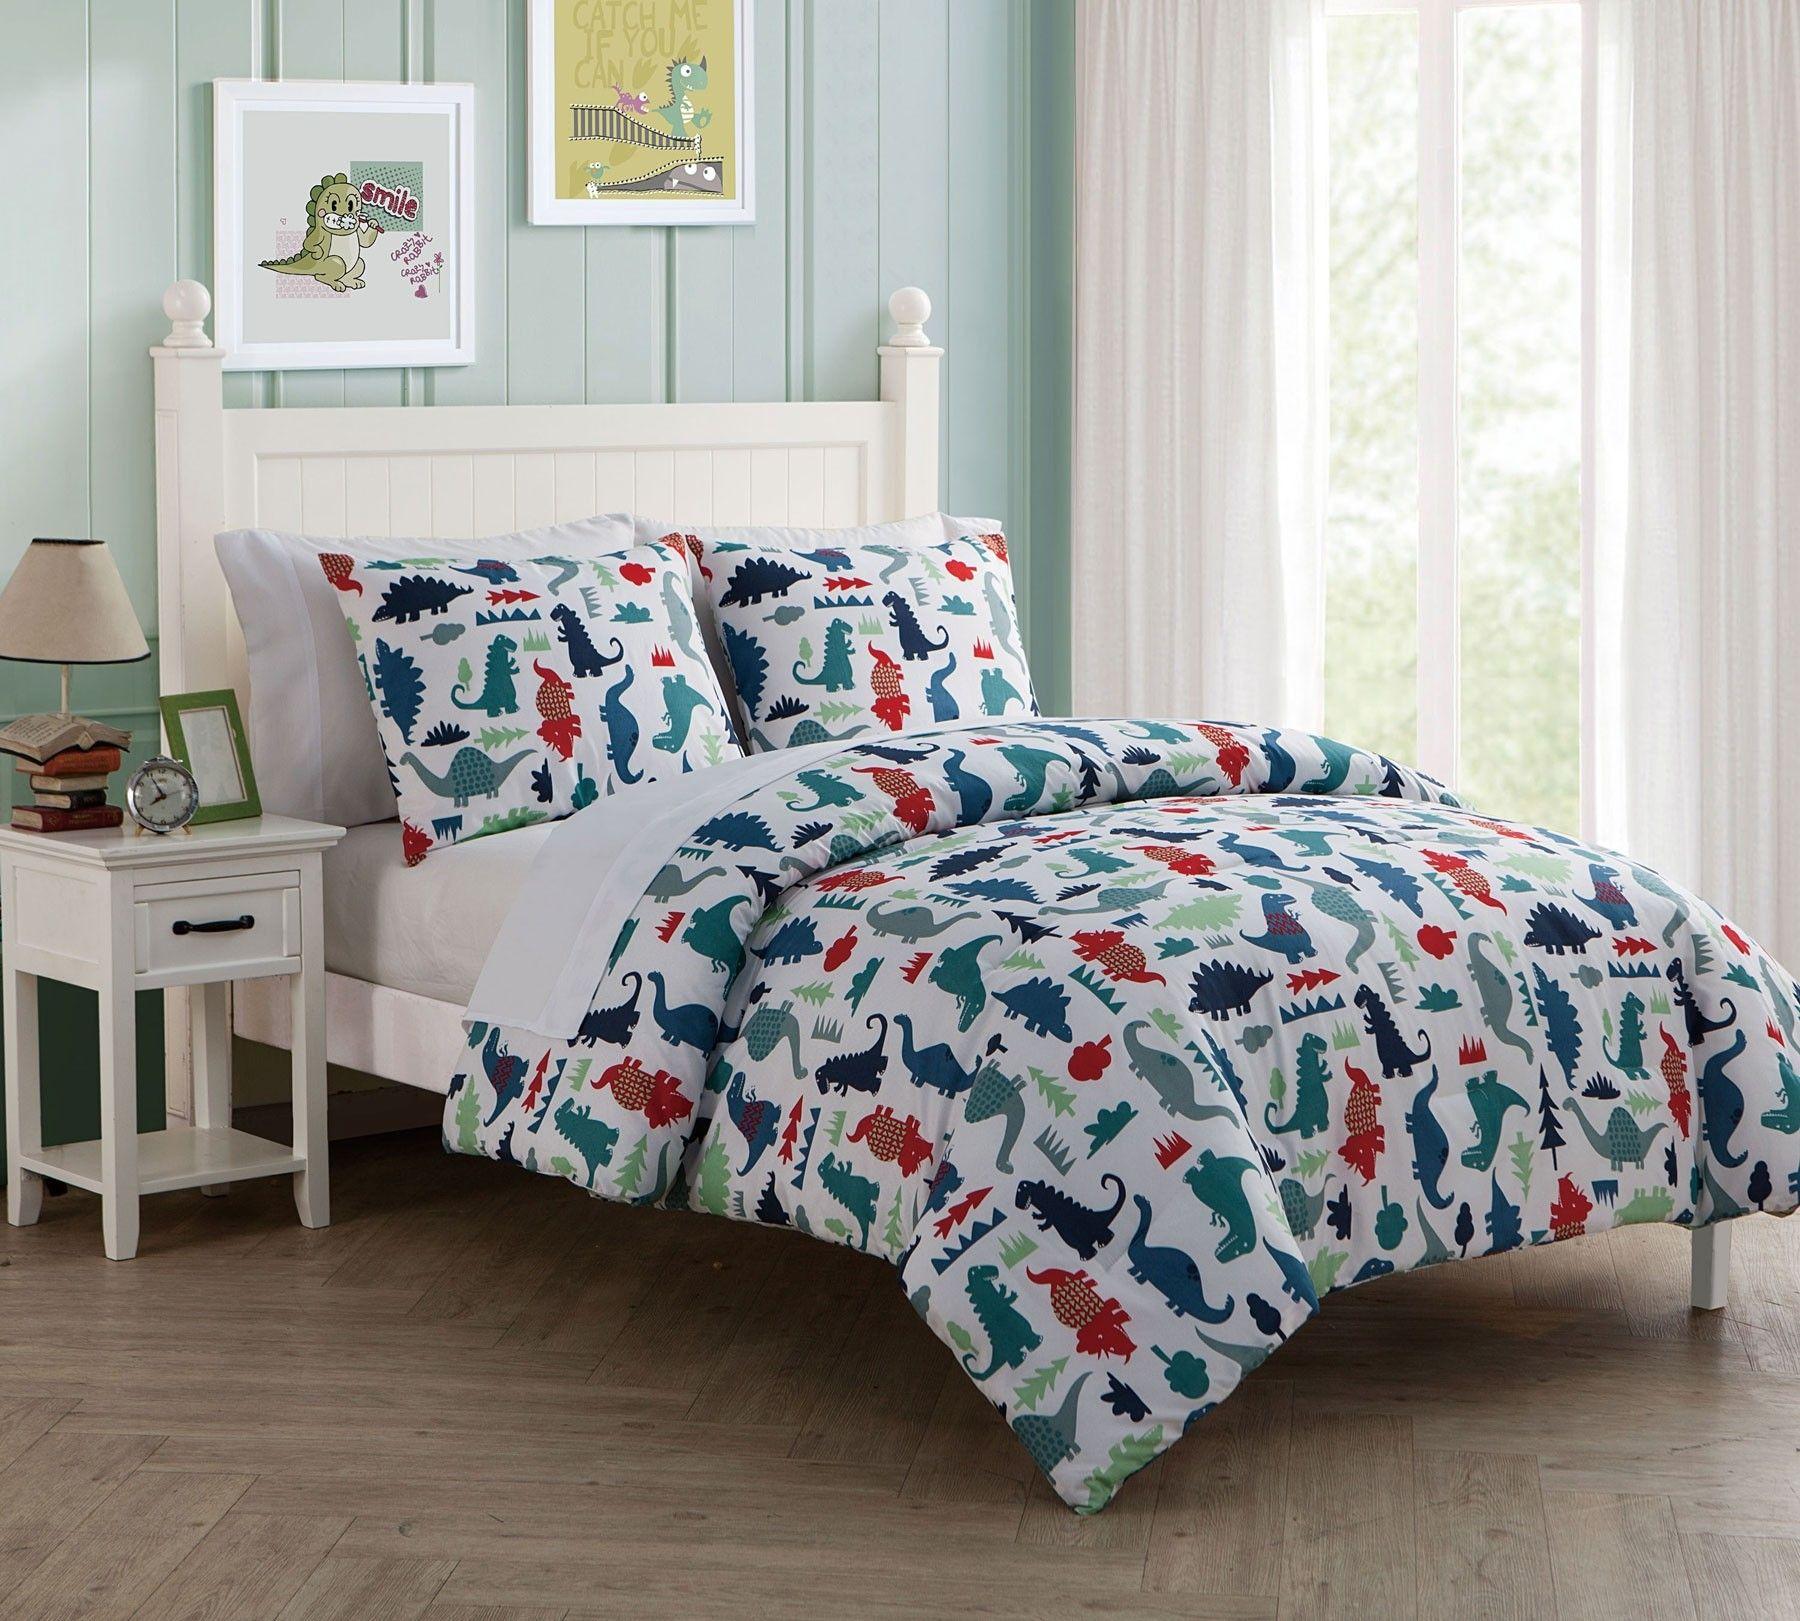 Vcny Owen Full Dinosaur Boys Bedding Comforter 7 Piece Dino Bed In A Bag Set Turn Your Child S Room Int Bed Comforters Comforter Sets Affordable Bedding Sets